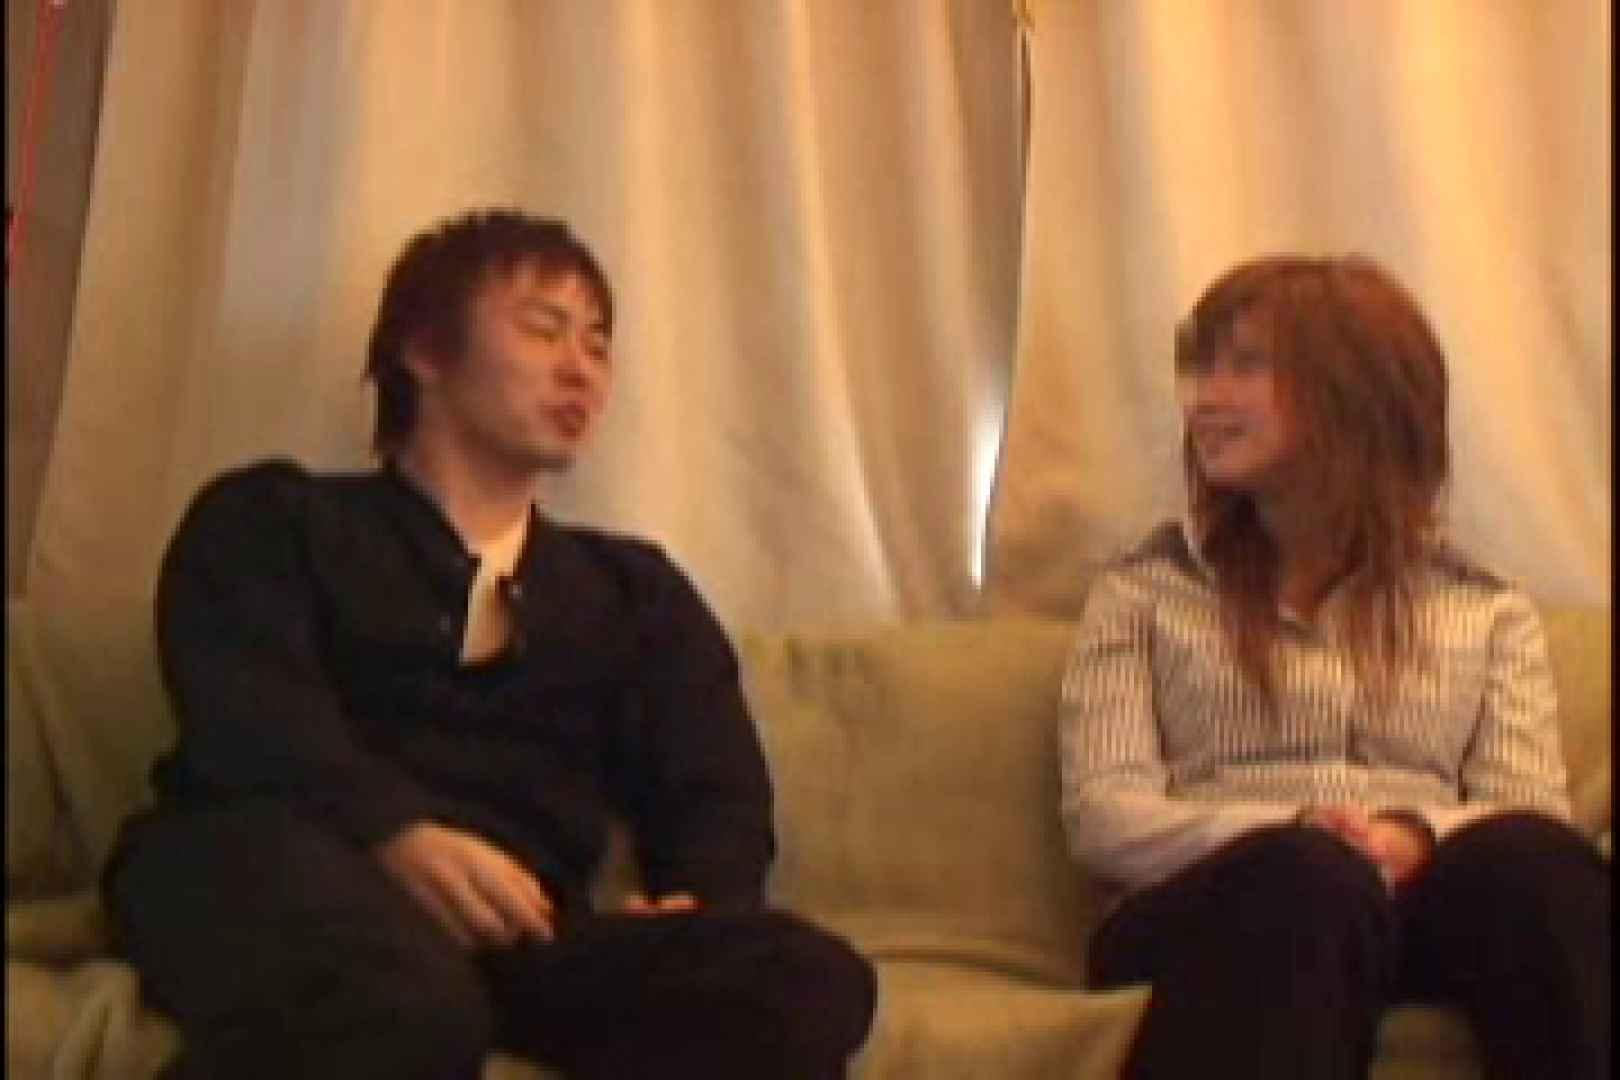 BEST OF イケメン!!男目線のガチSEX vol.03(対女性作品) フェラ天国 ゲイエロ動画 55pic 4